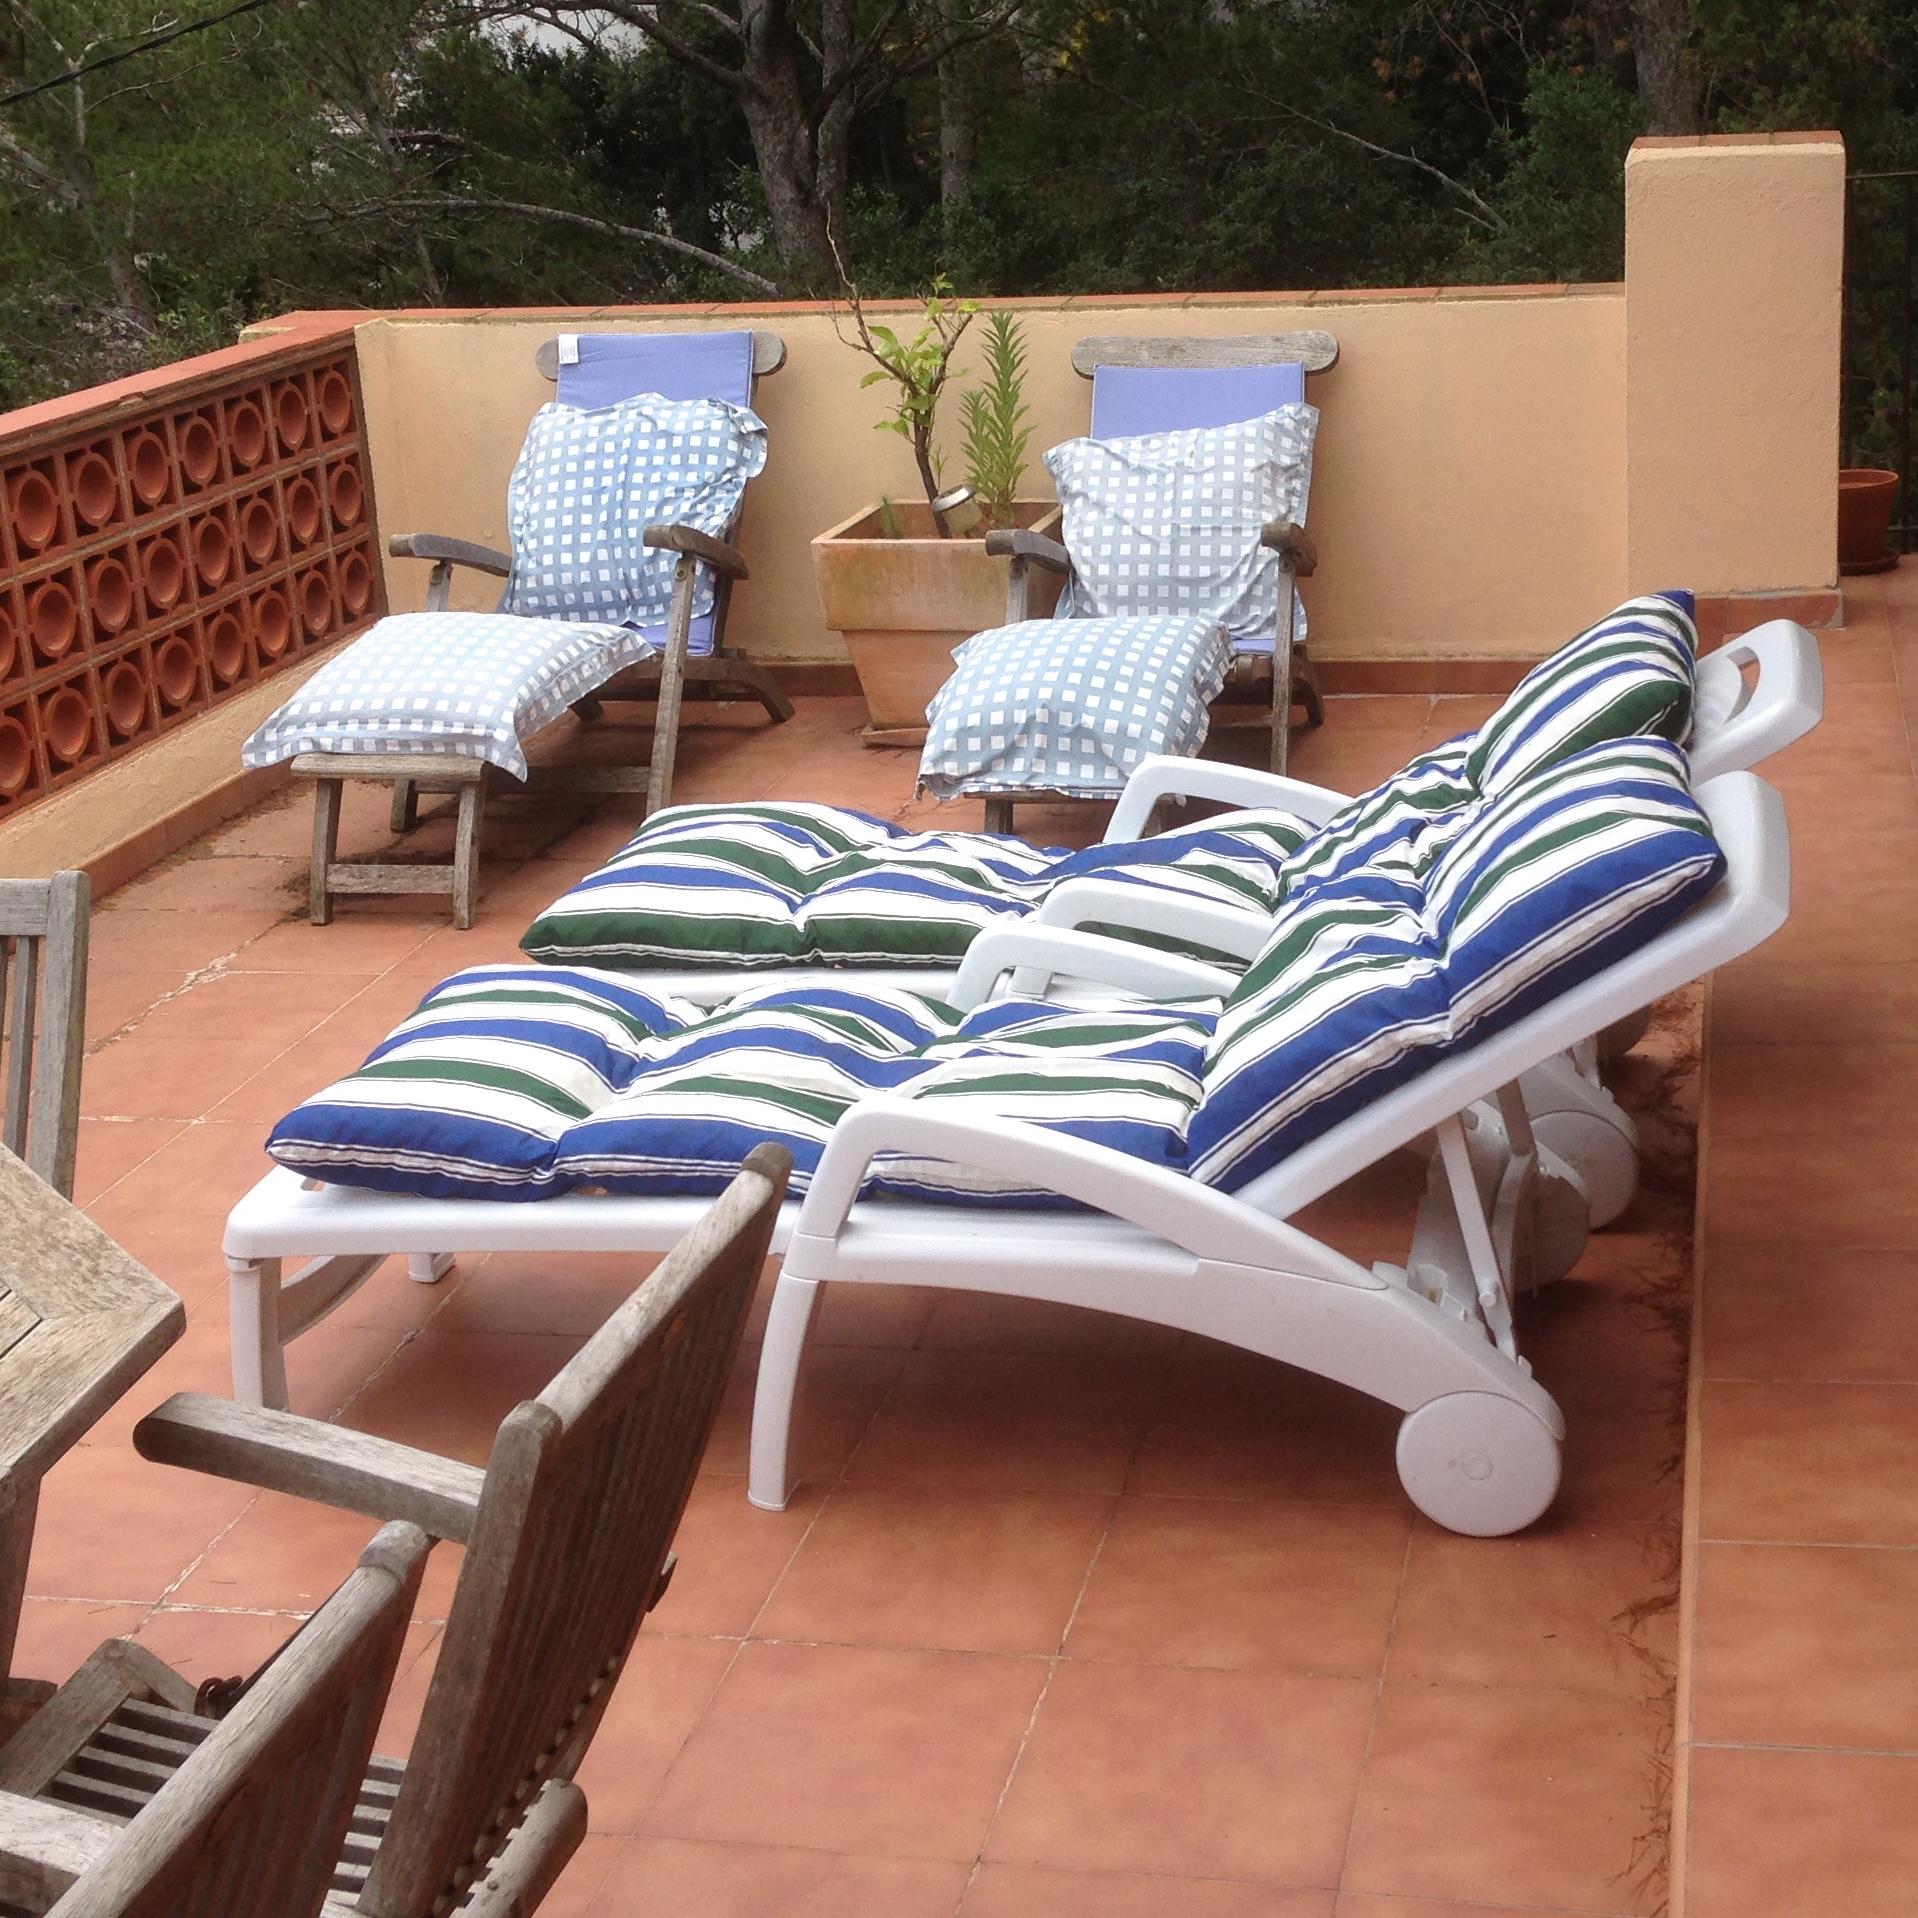 Enjoy the sunshine of the Costa Brava